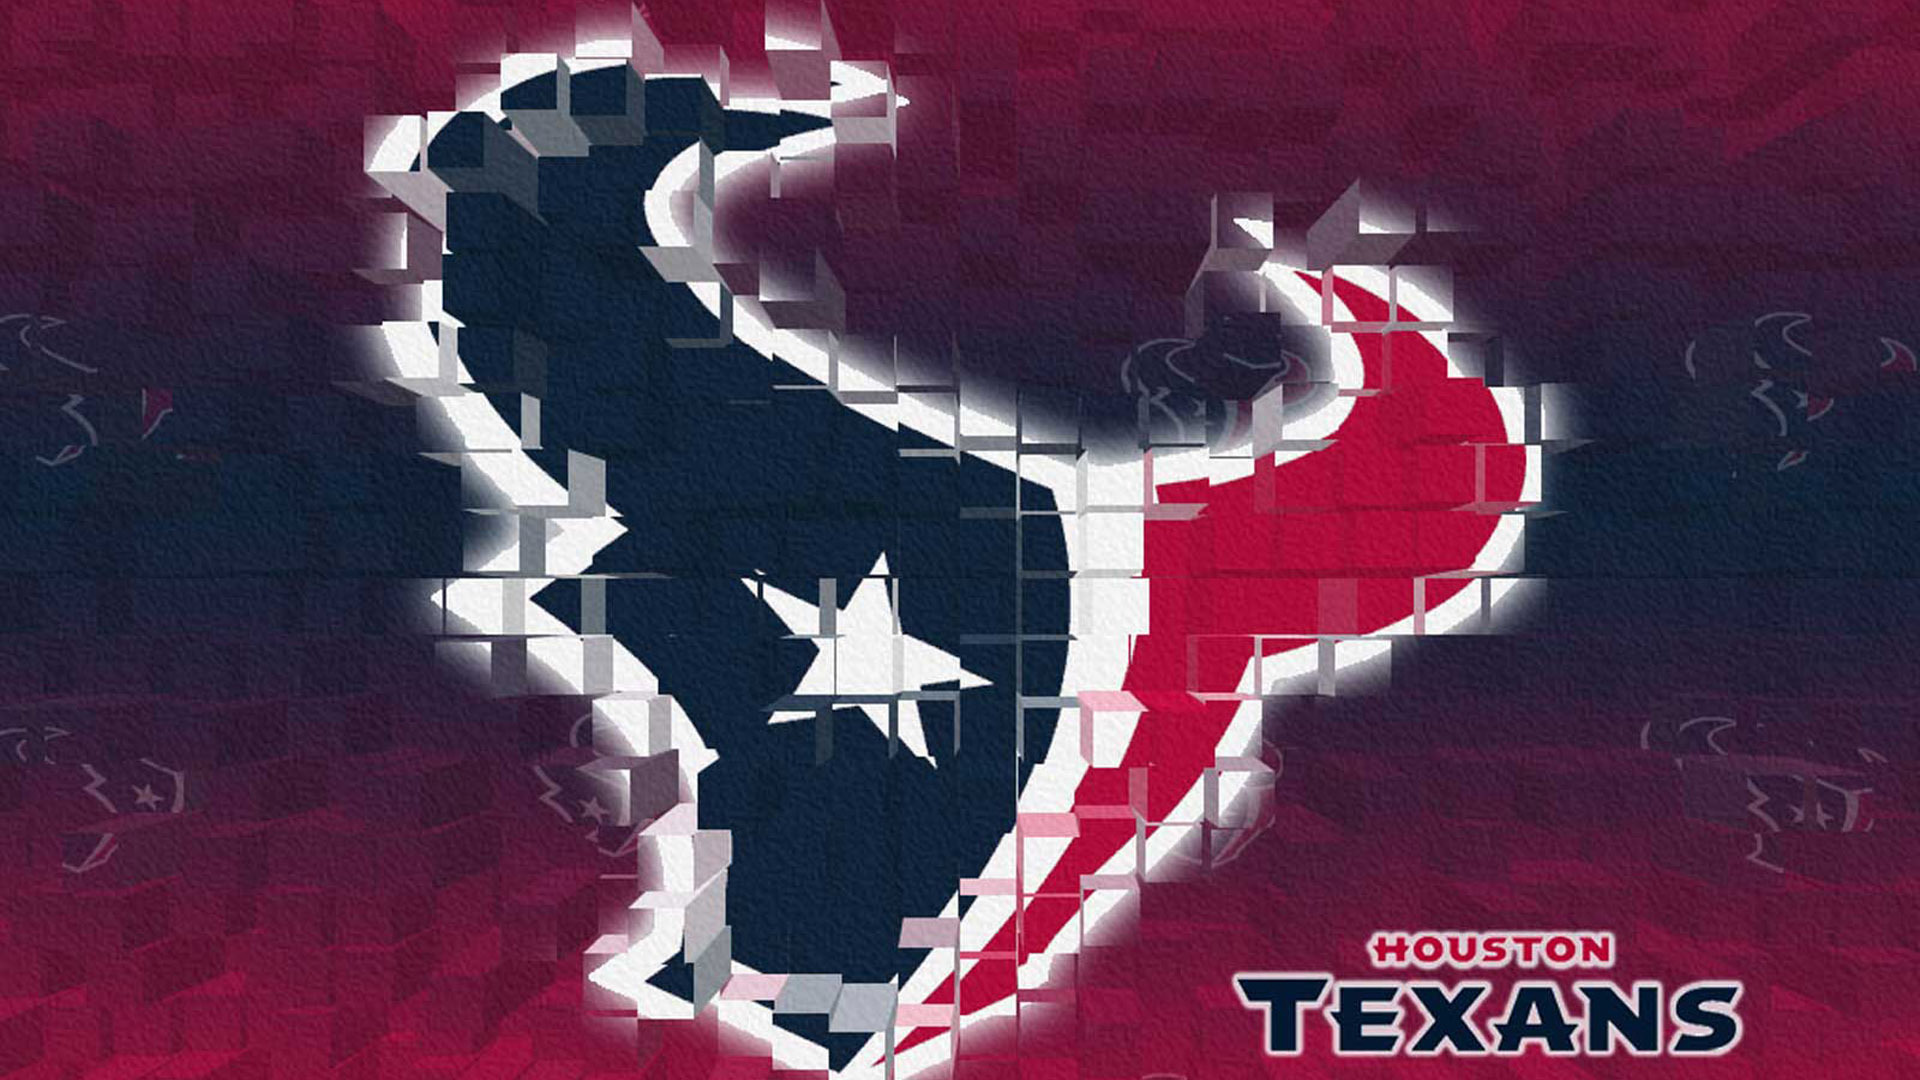 Houston Texans High Definition